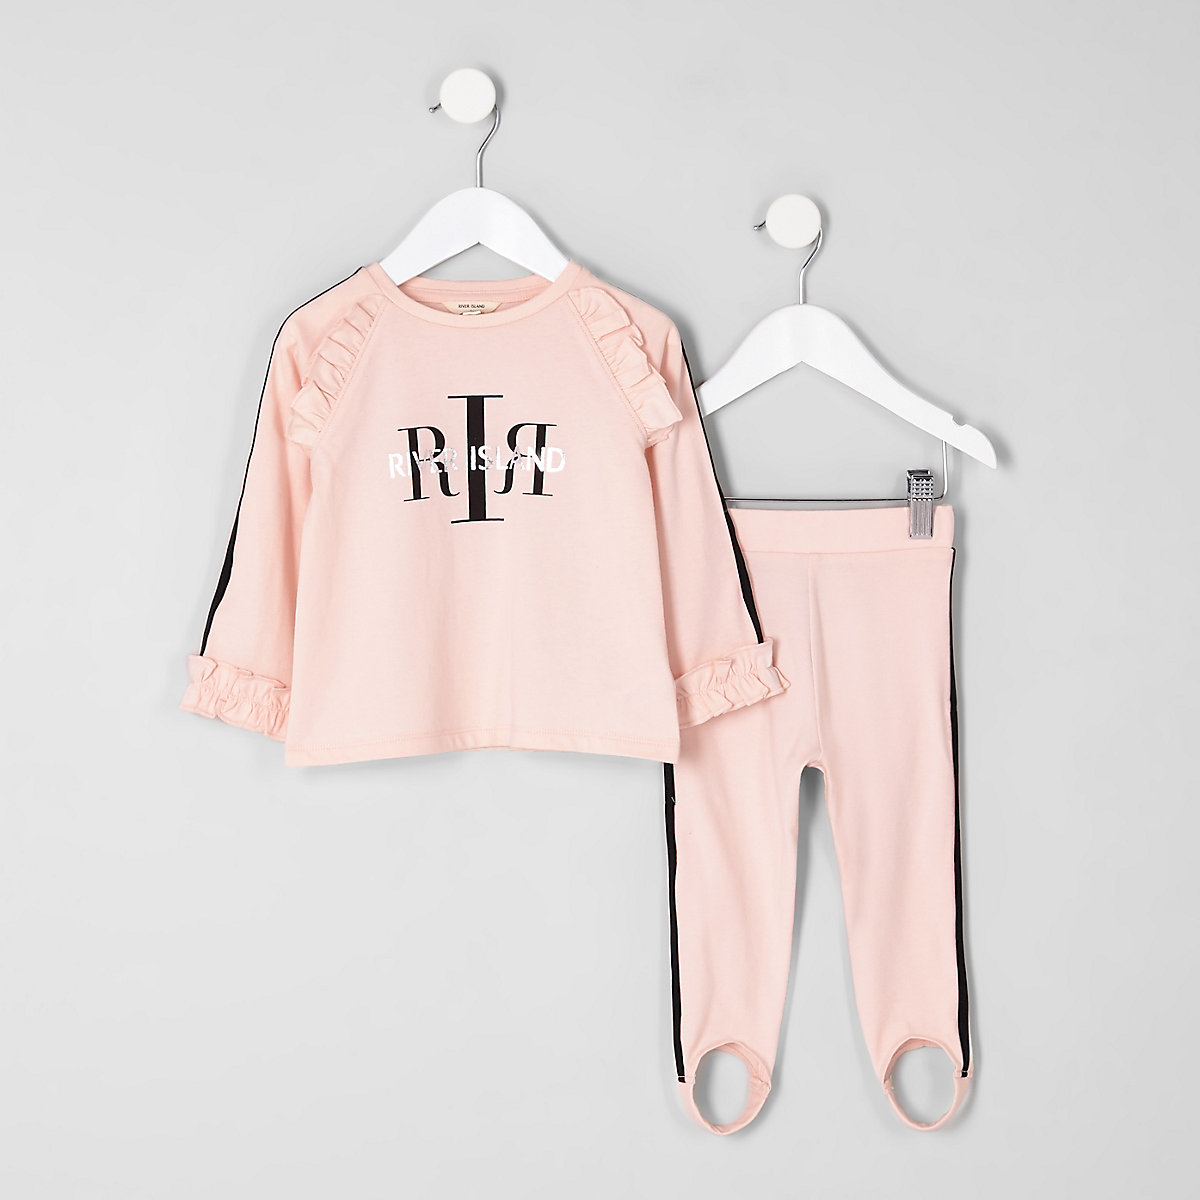 Mini girls pink RI frill top sports outfit